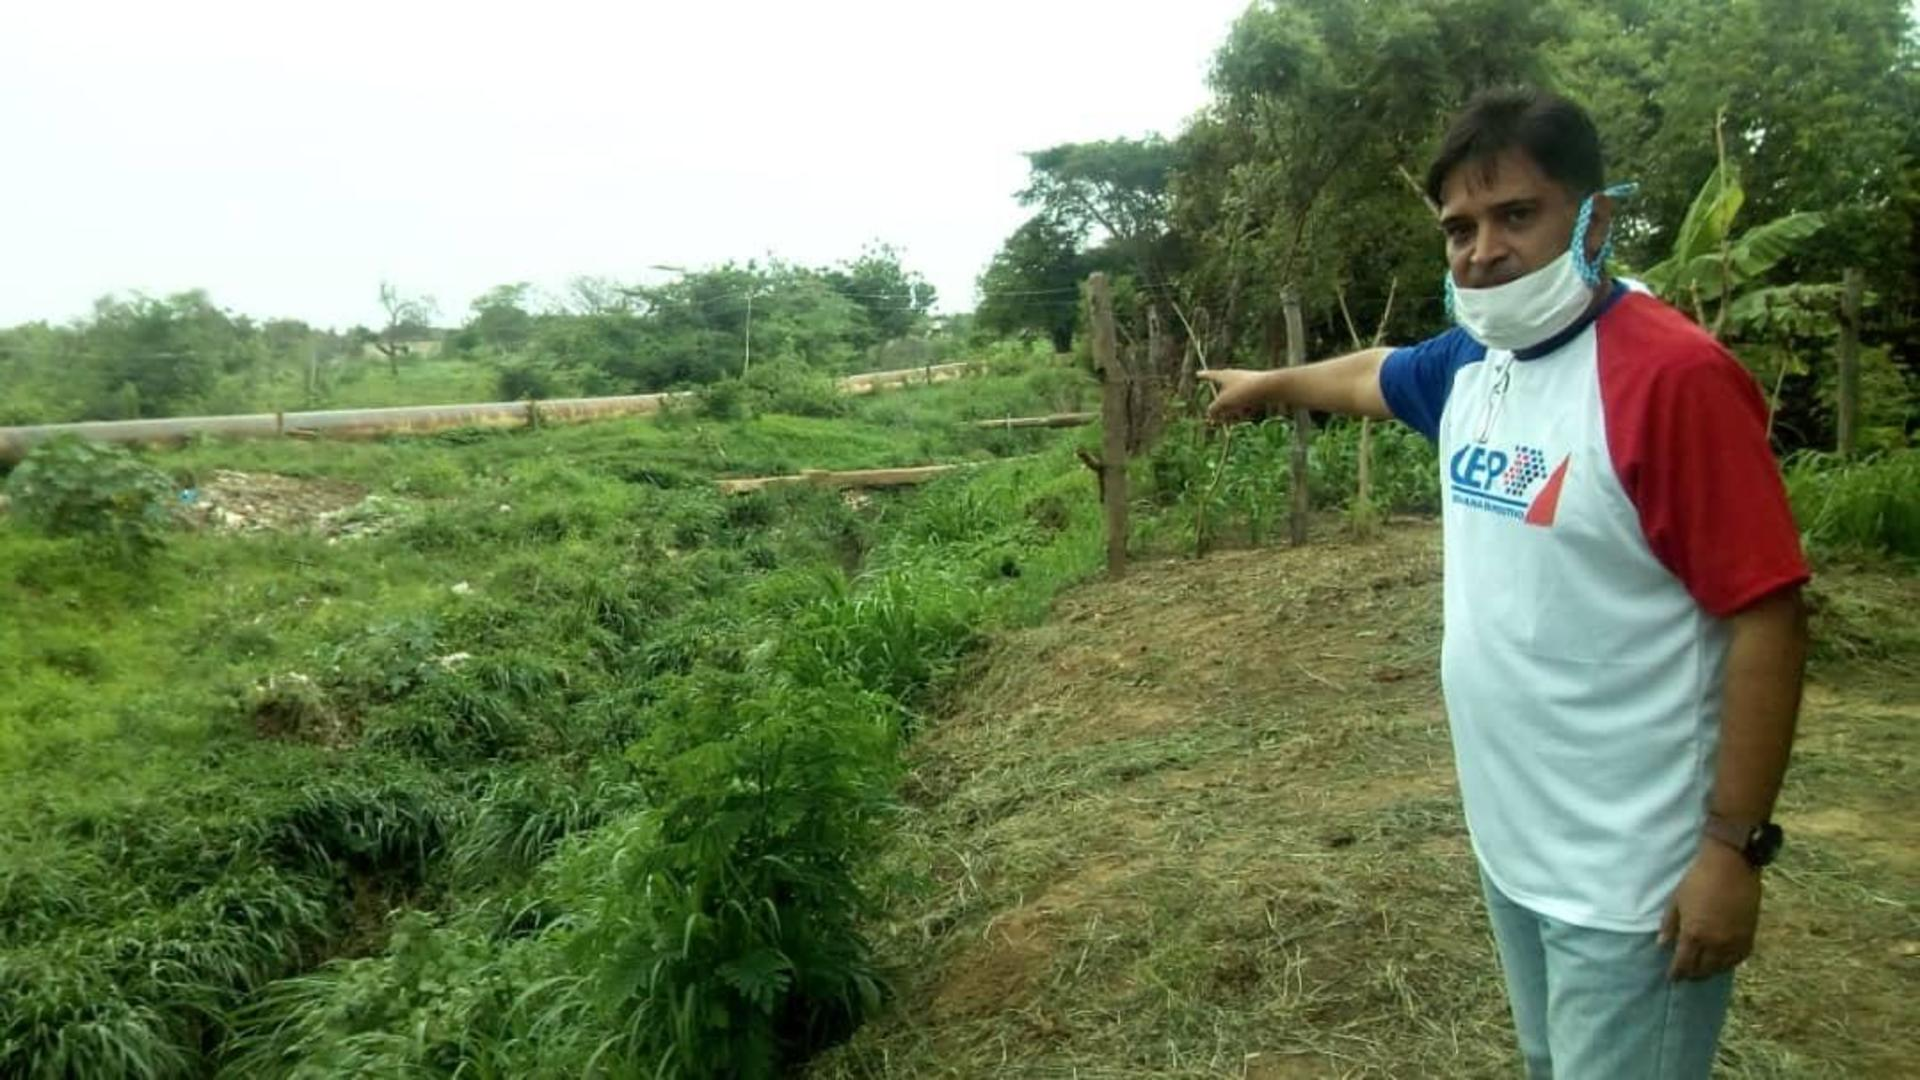 Pedro Mercado: Los venezolanos pasan hasta dos meses sin agua